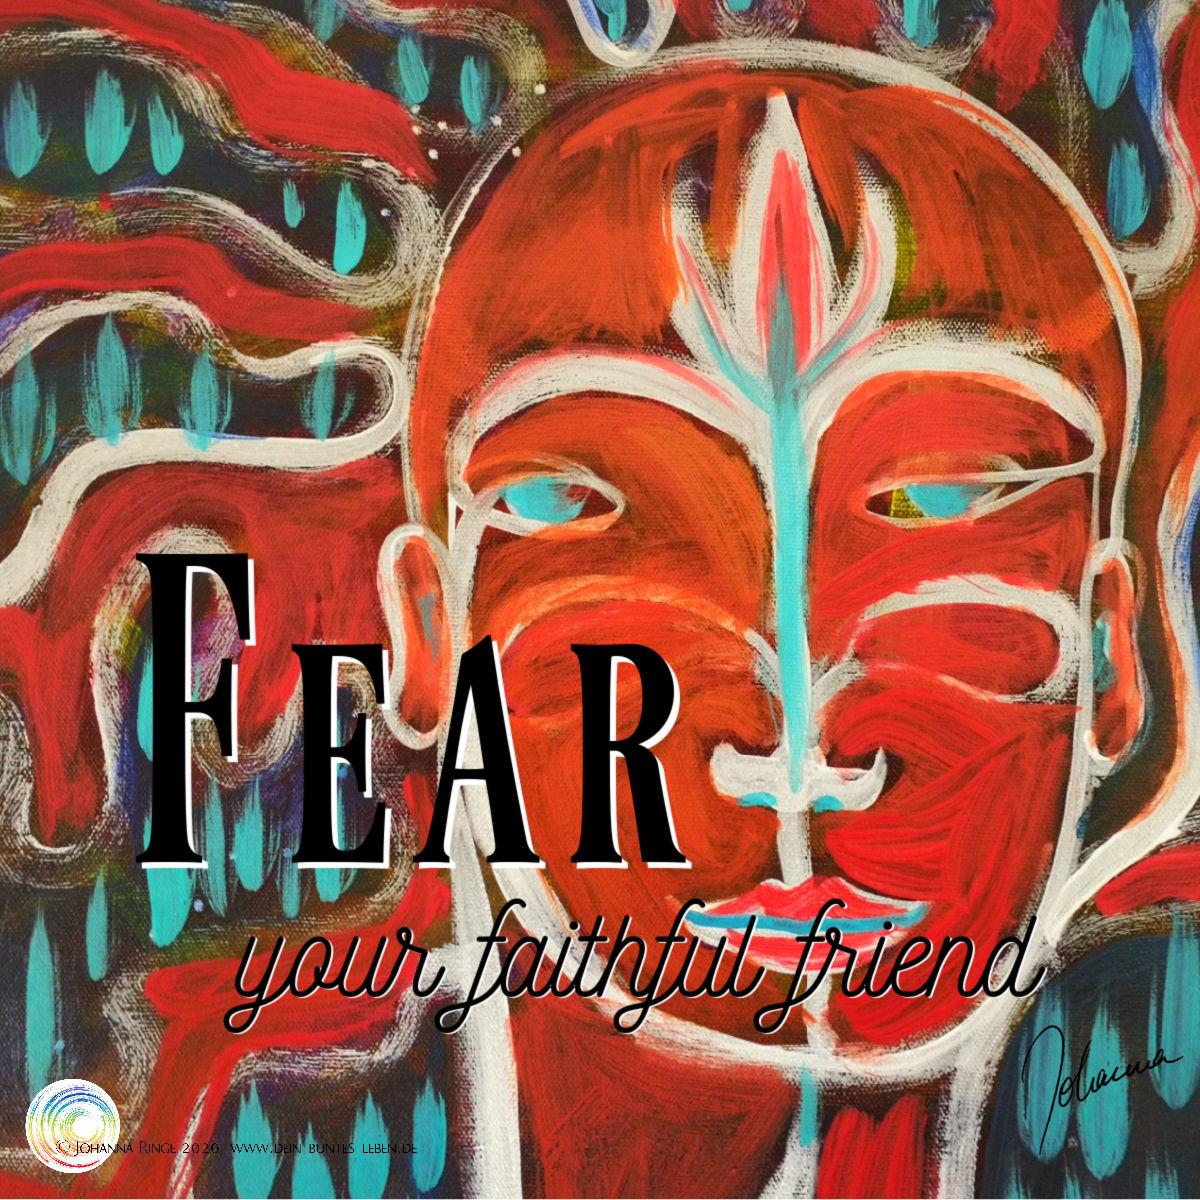 Fear, your faithful friend. (Text on painting of a ominous face) ©Johanna Ringe 2020 www.johannaringe.com